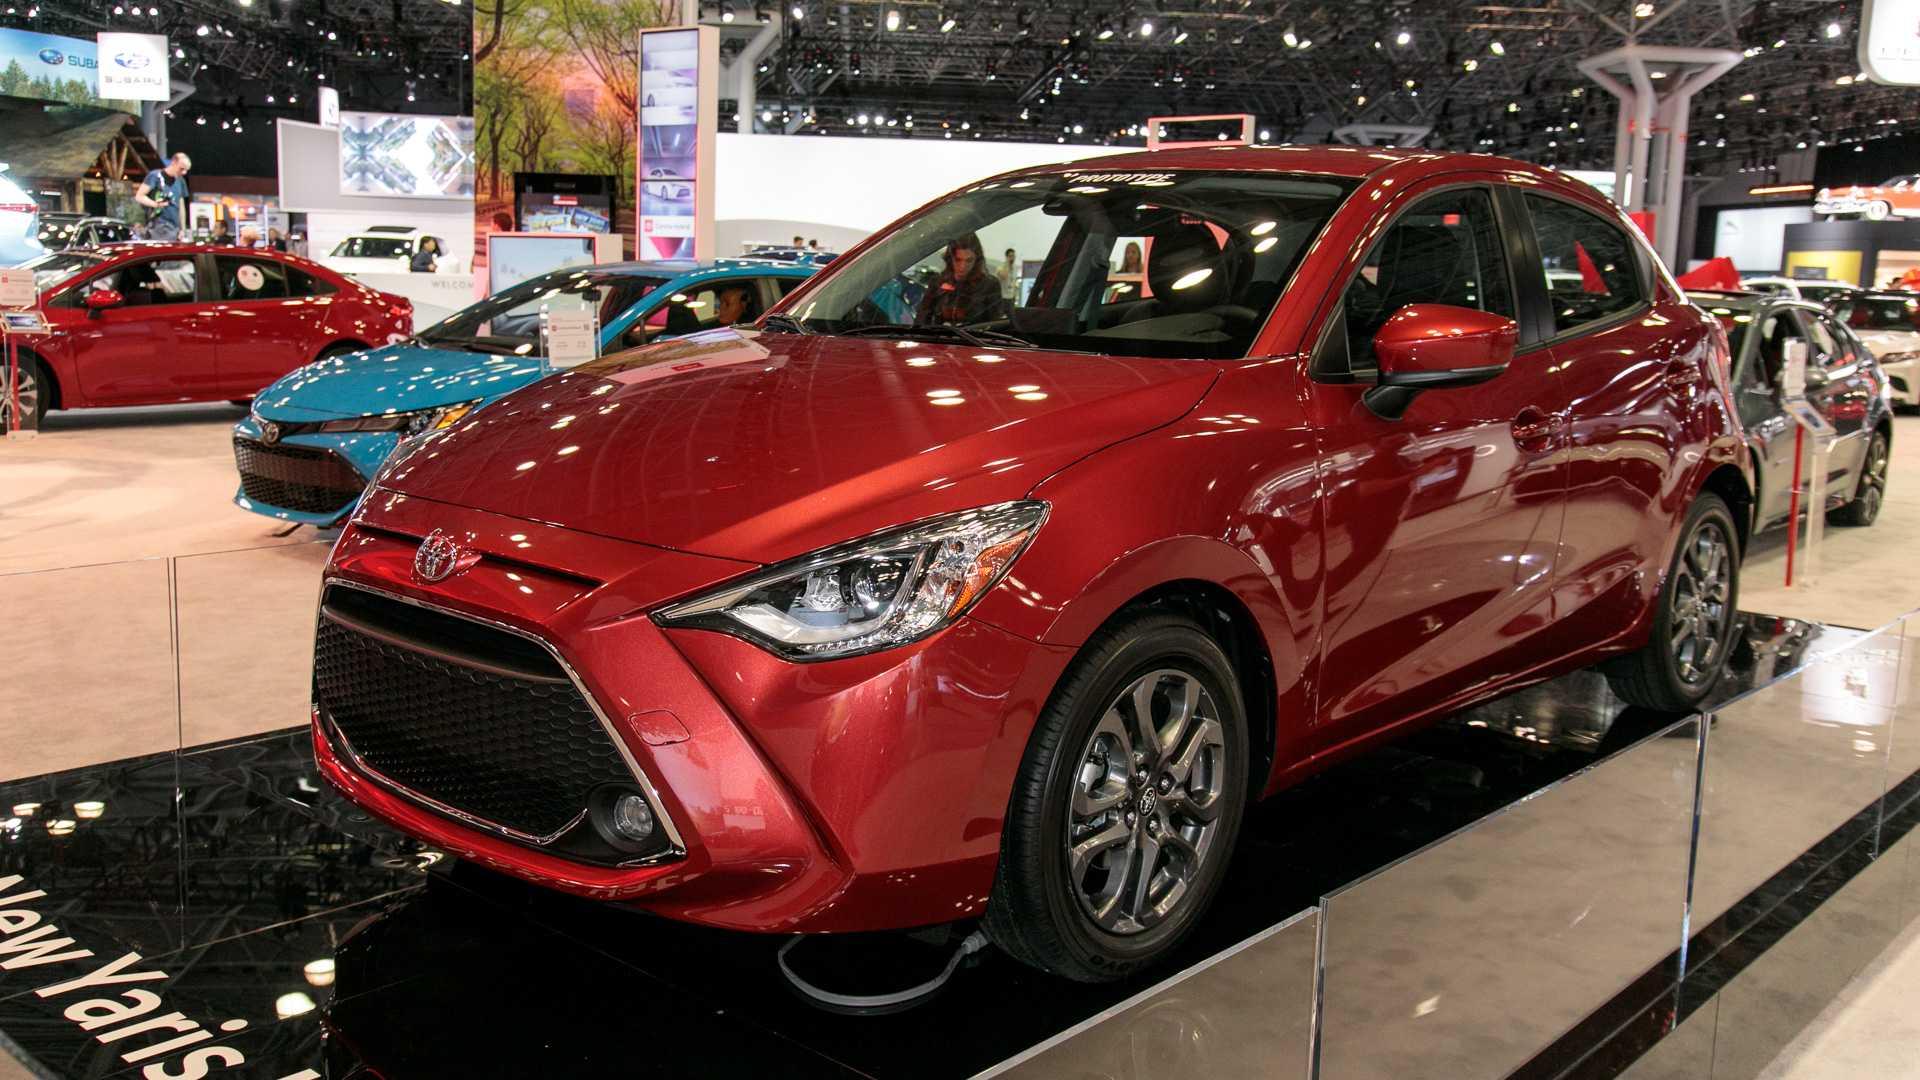 2020-toyota-yaris-hatchback-1.jpg